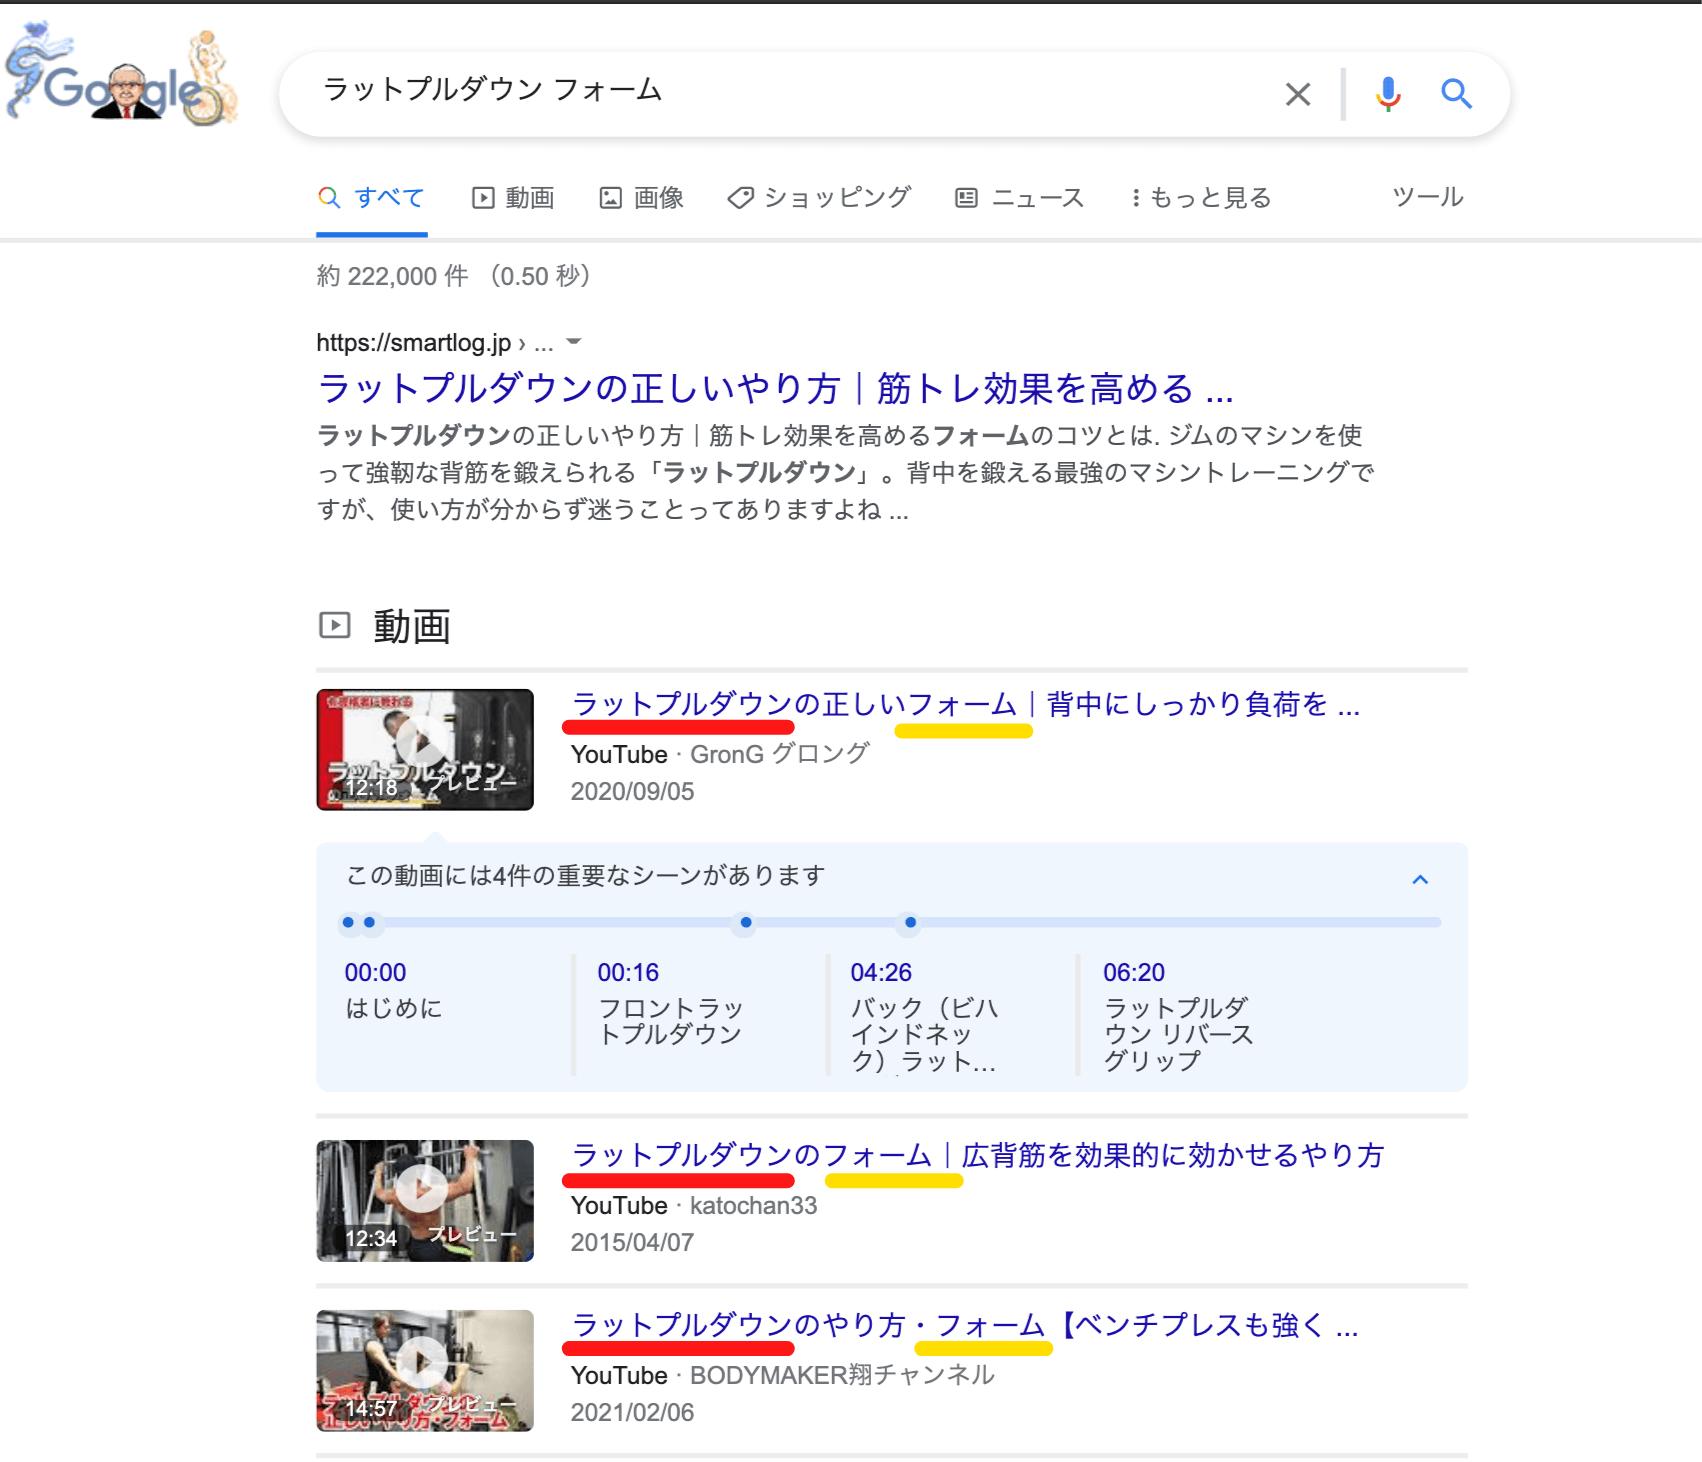 google-ratpull form-top display